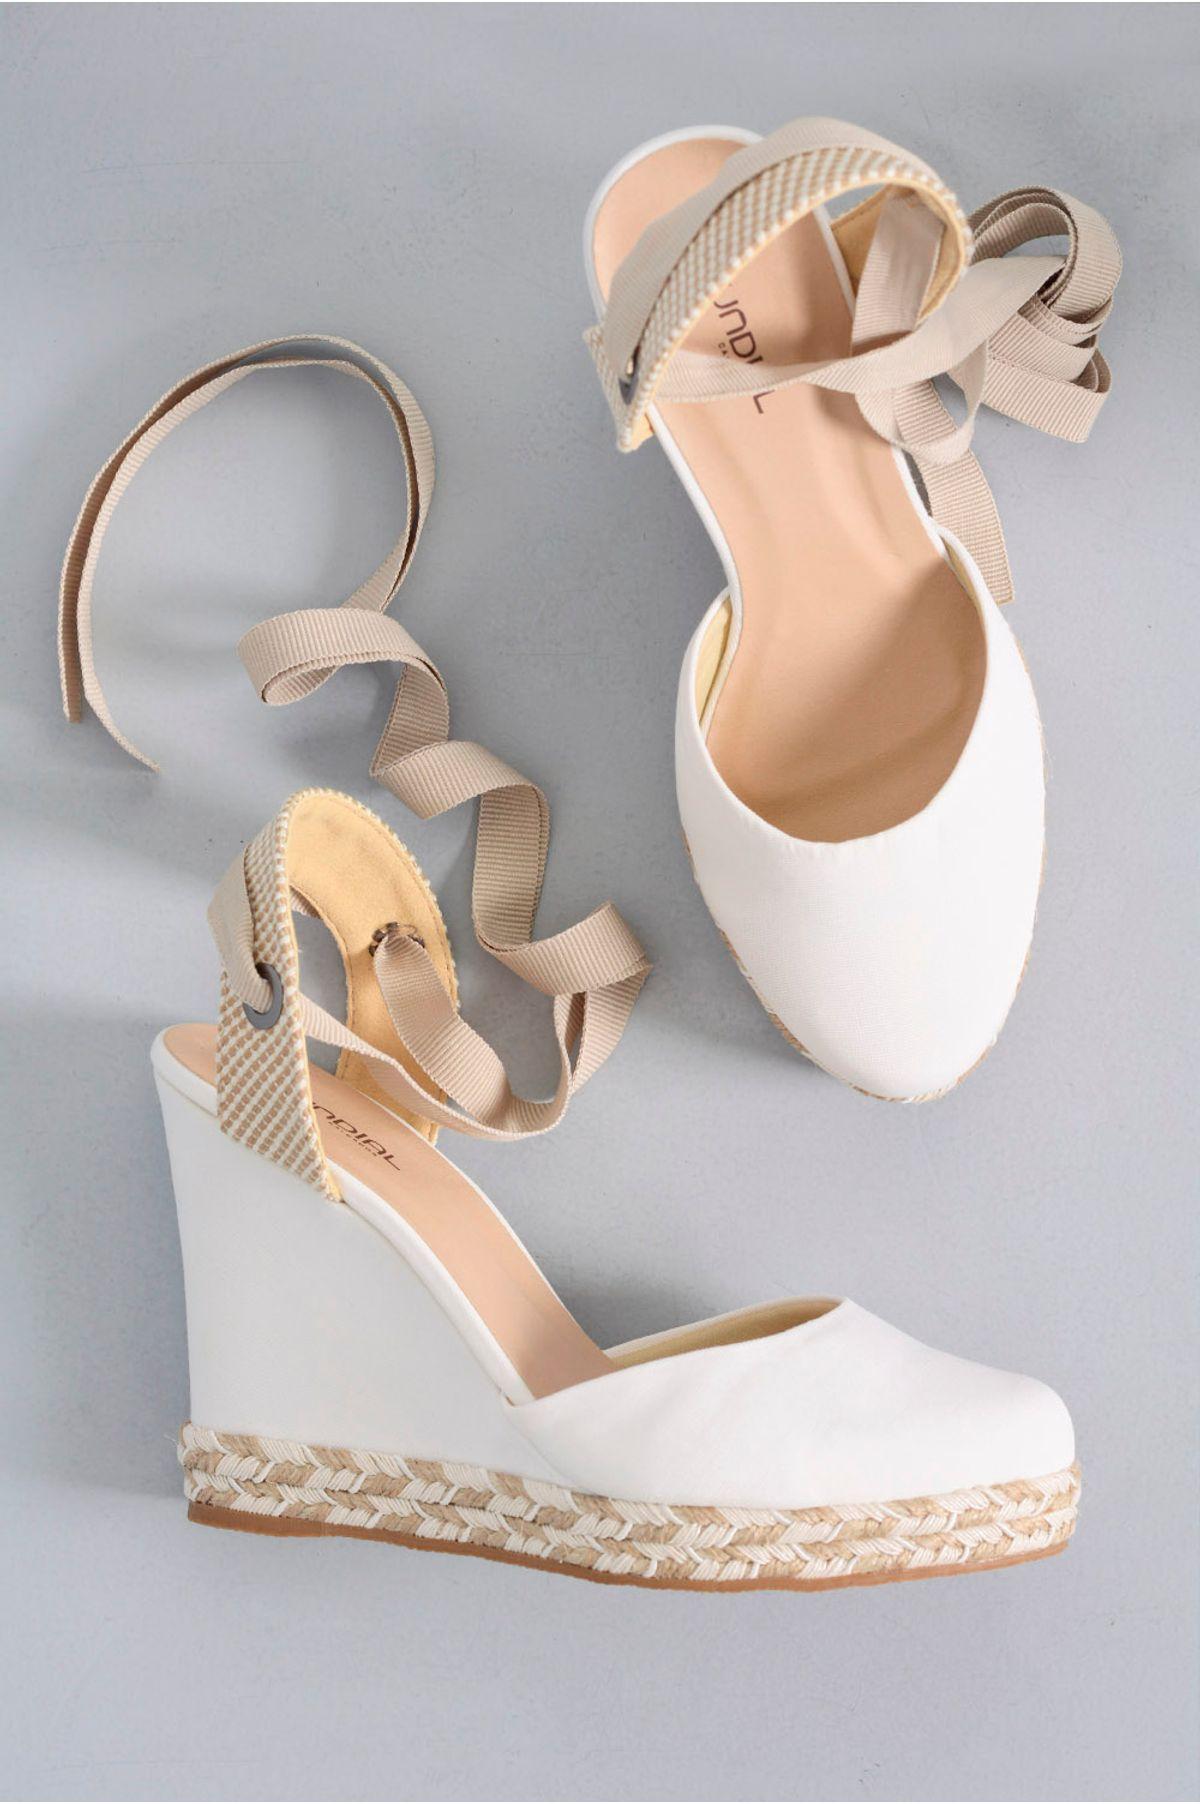 d54bd5018 Sapato Feminino Anabela Consuelo Mundial TEC - BRANCO - Mundial Calçados